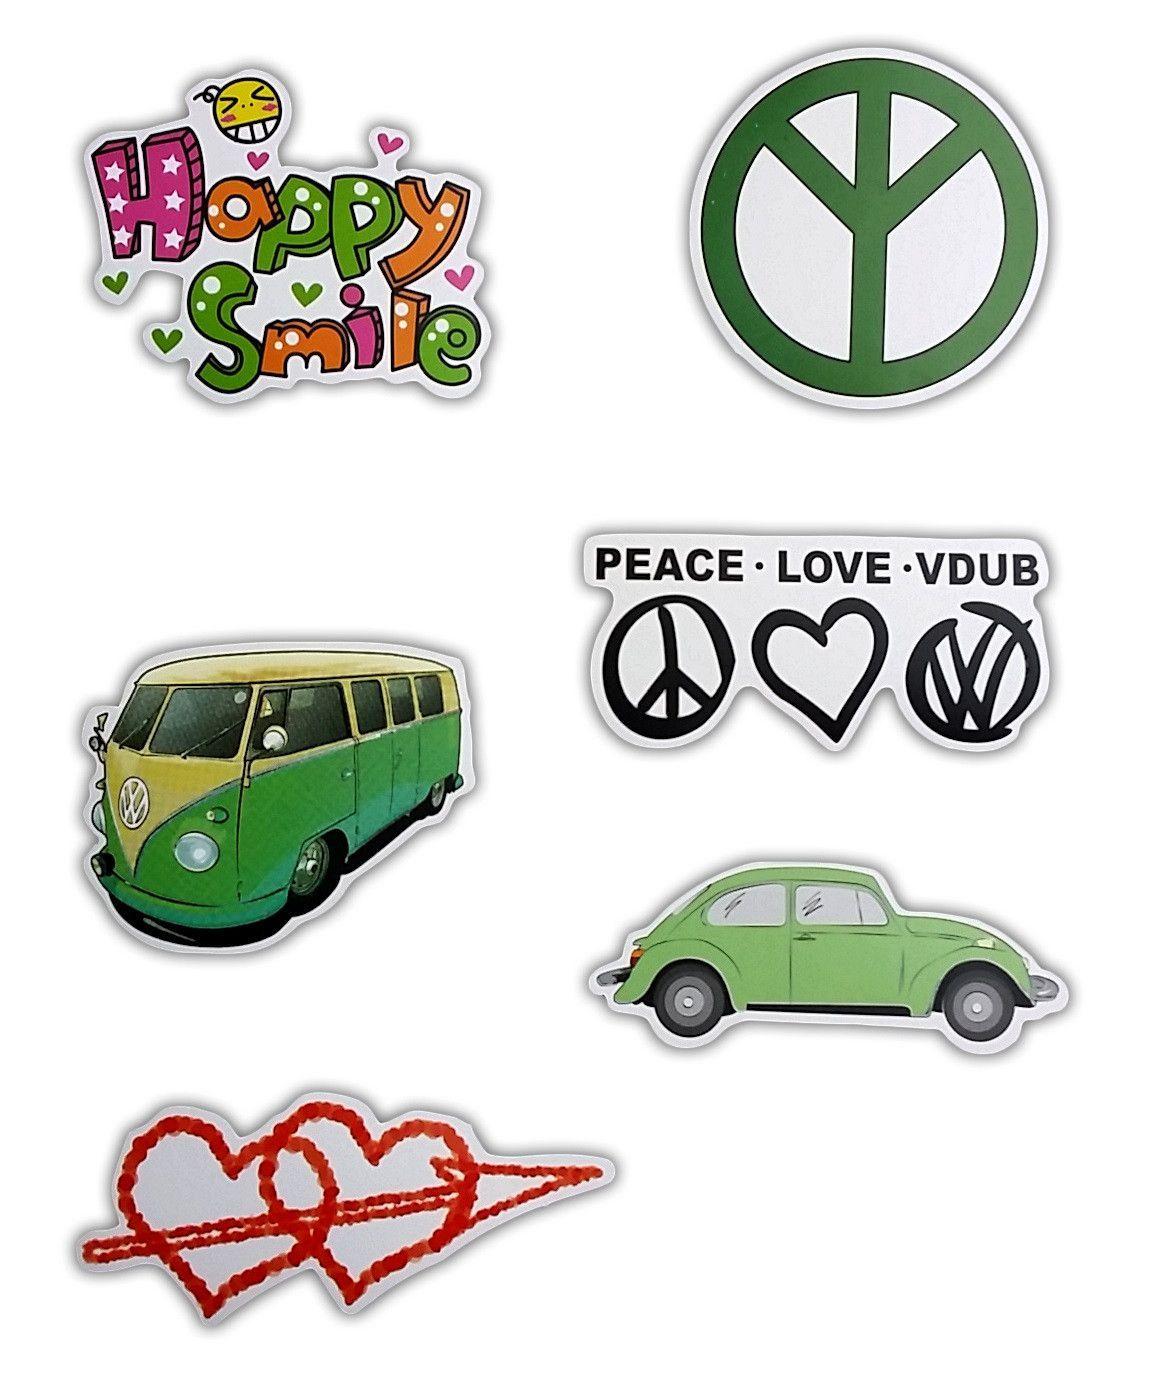 Volkswagen Vdub Peace Love Skateboard Stickers Set Of 6 Stickers Skateboard Stickers Sticker Set Peace And Love [ 1385 x 1151 Pixel ]